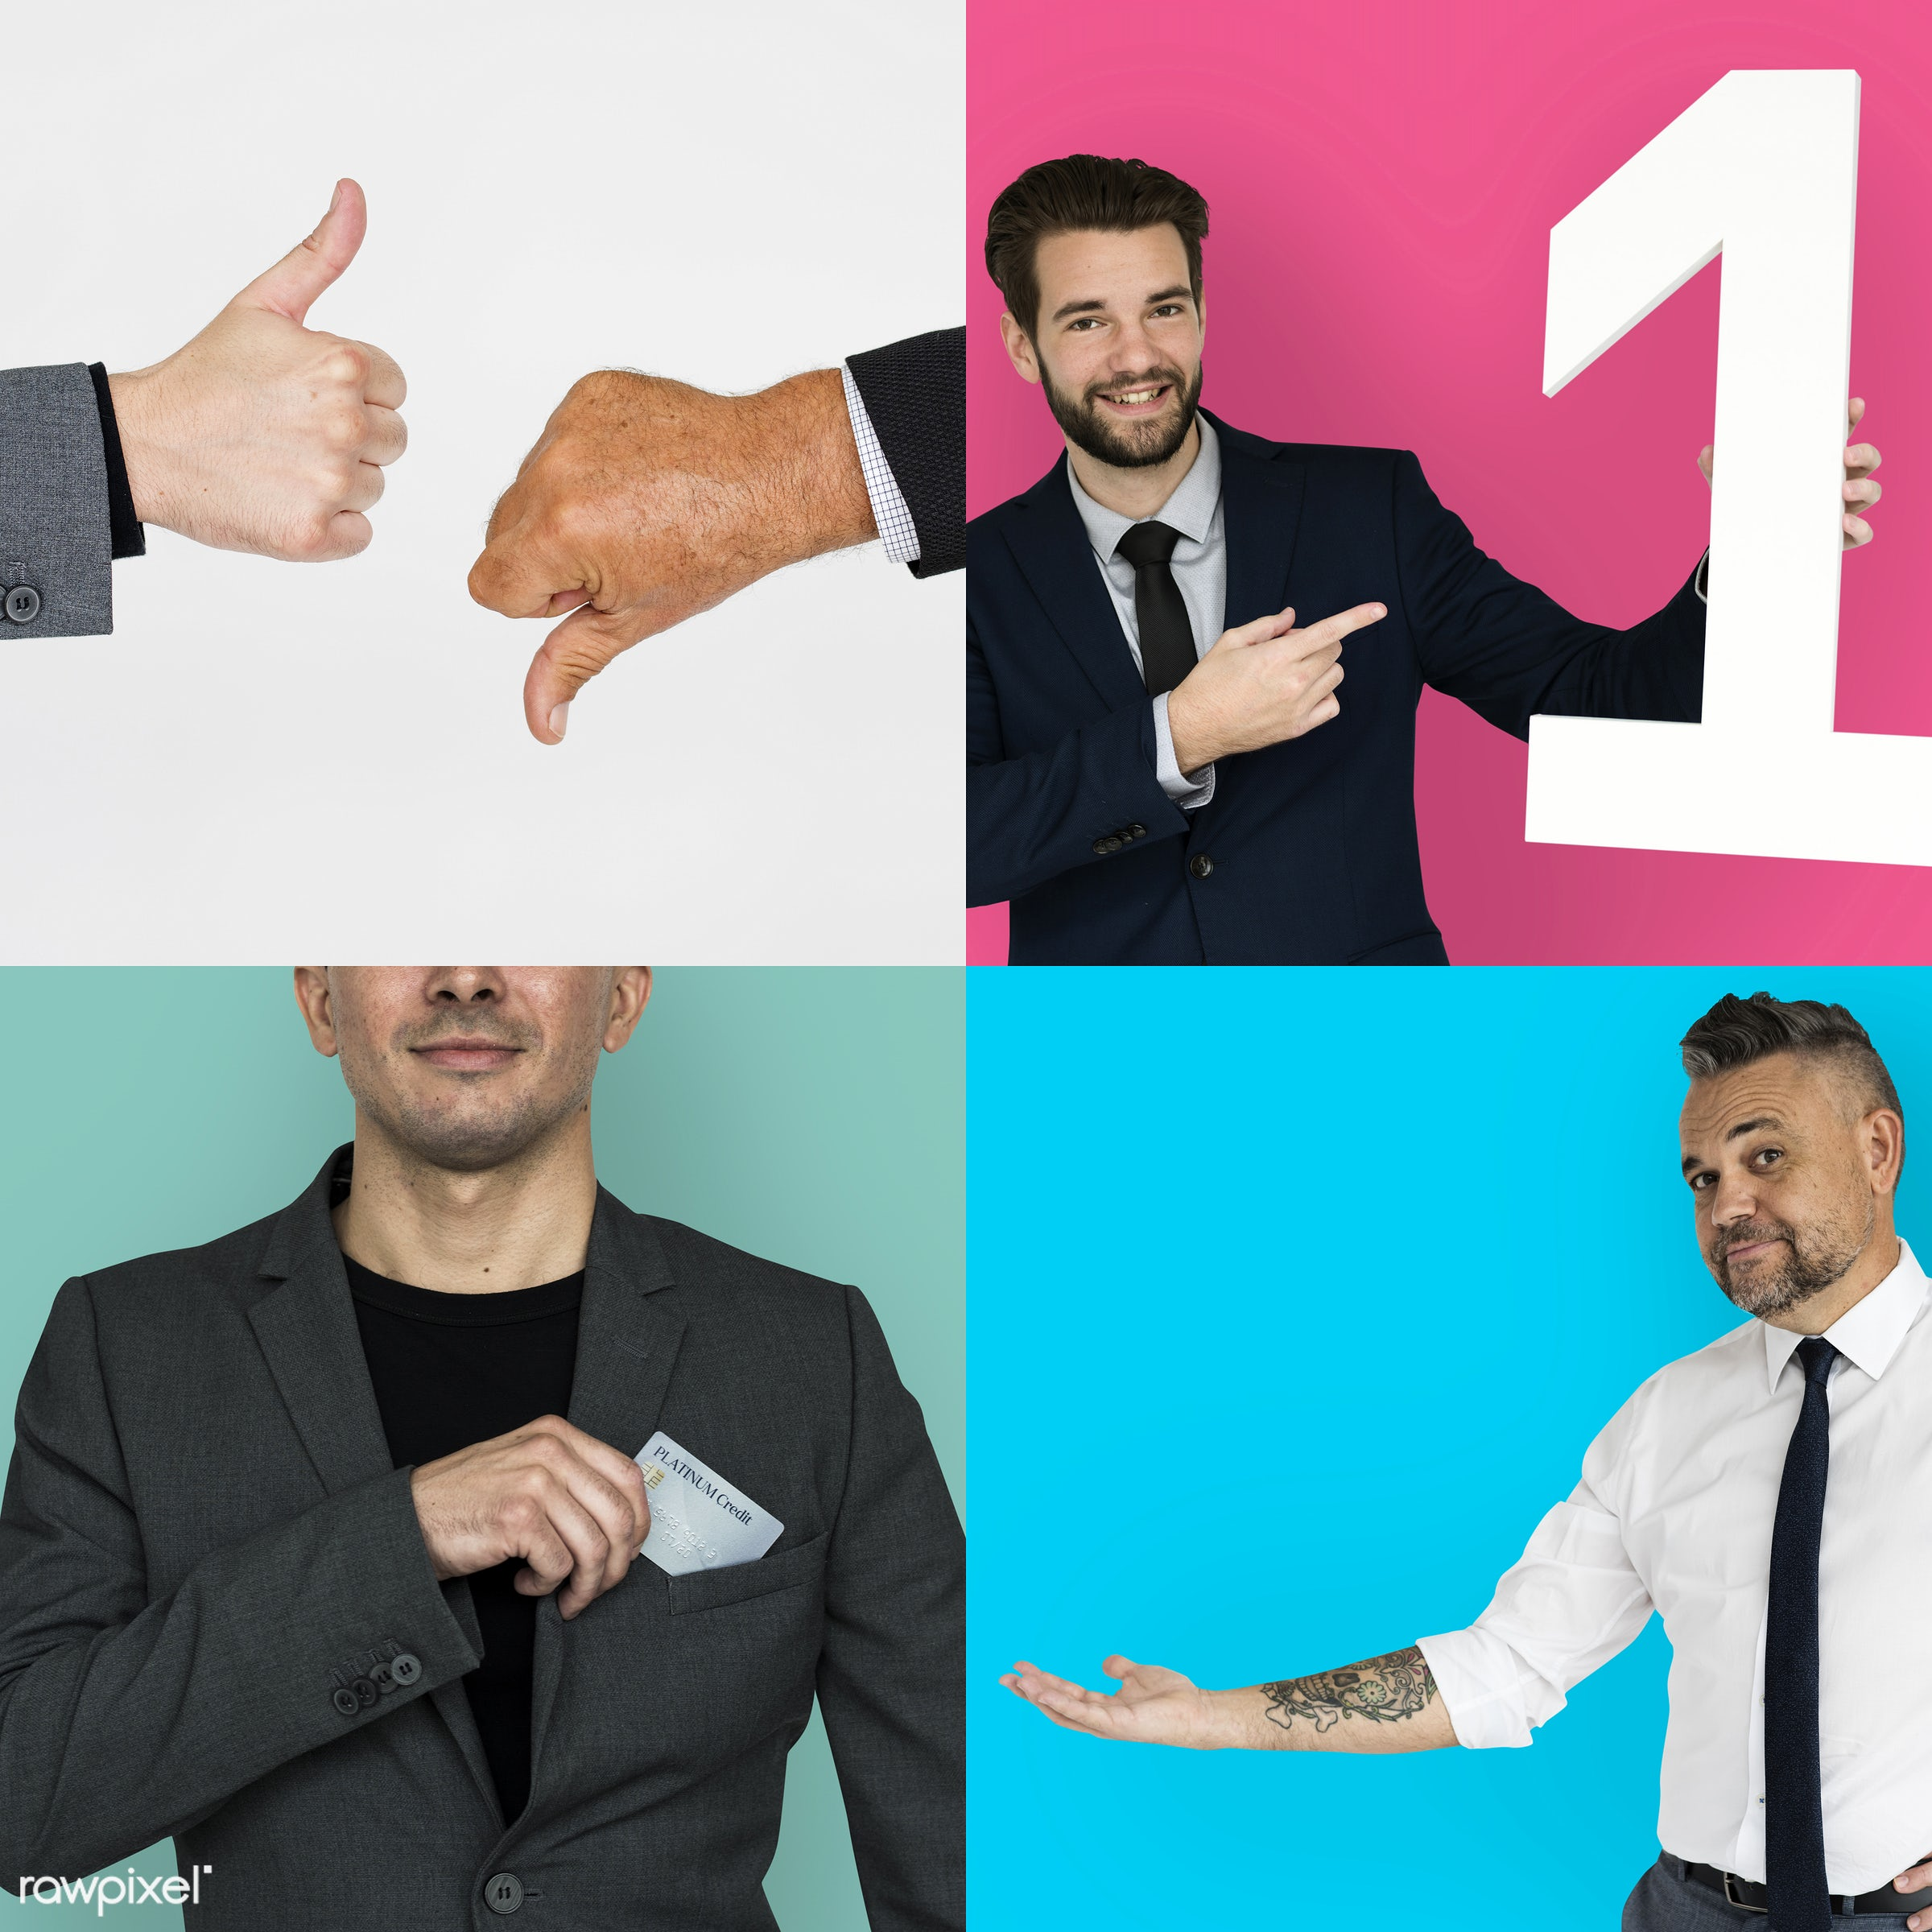 achieve, achievement, adult, aim, business, businessman, businessmen, career, challenge, cheerful, collage, communication,...